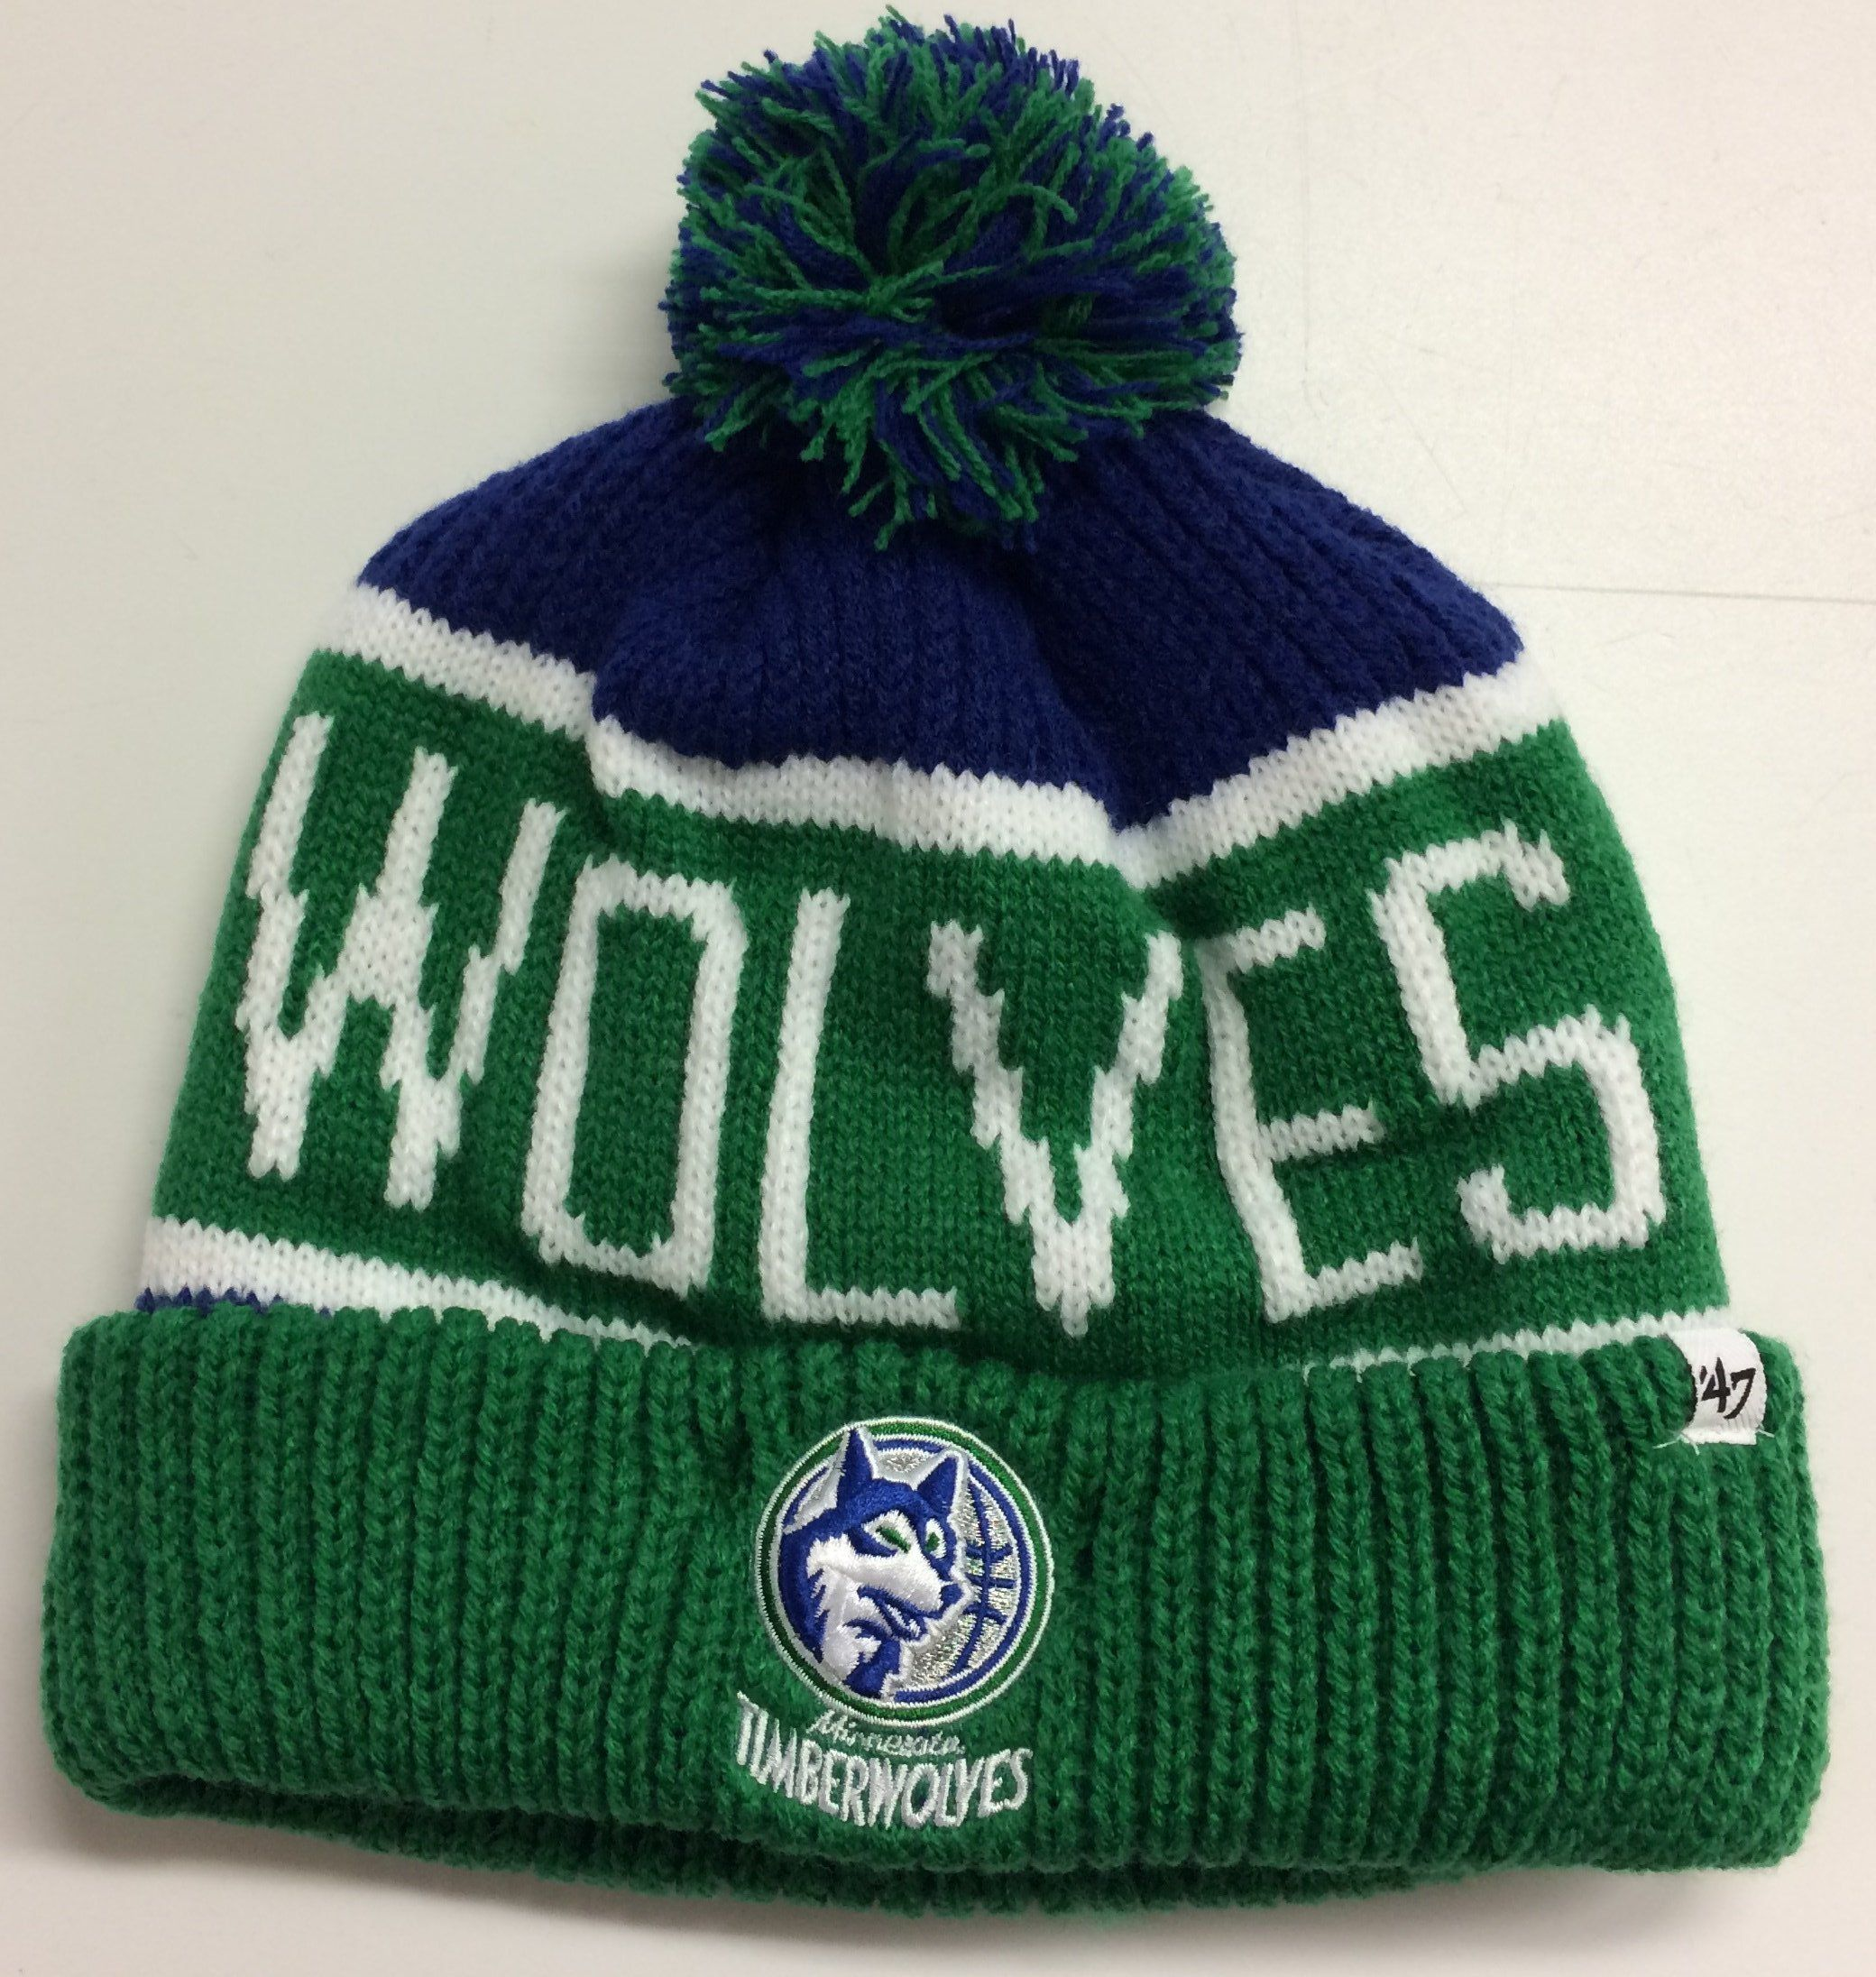 Minnesota Timberwolves  47 Brand Calgary NBA Knit Hat Retro Beanie Stocking  Cap Cuff   Pom Hardwood Classics Wolves 9c88fbe6759